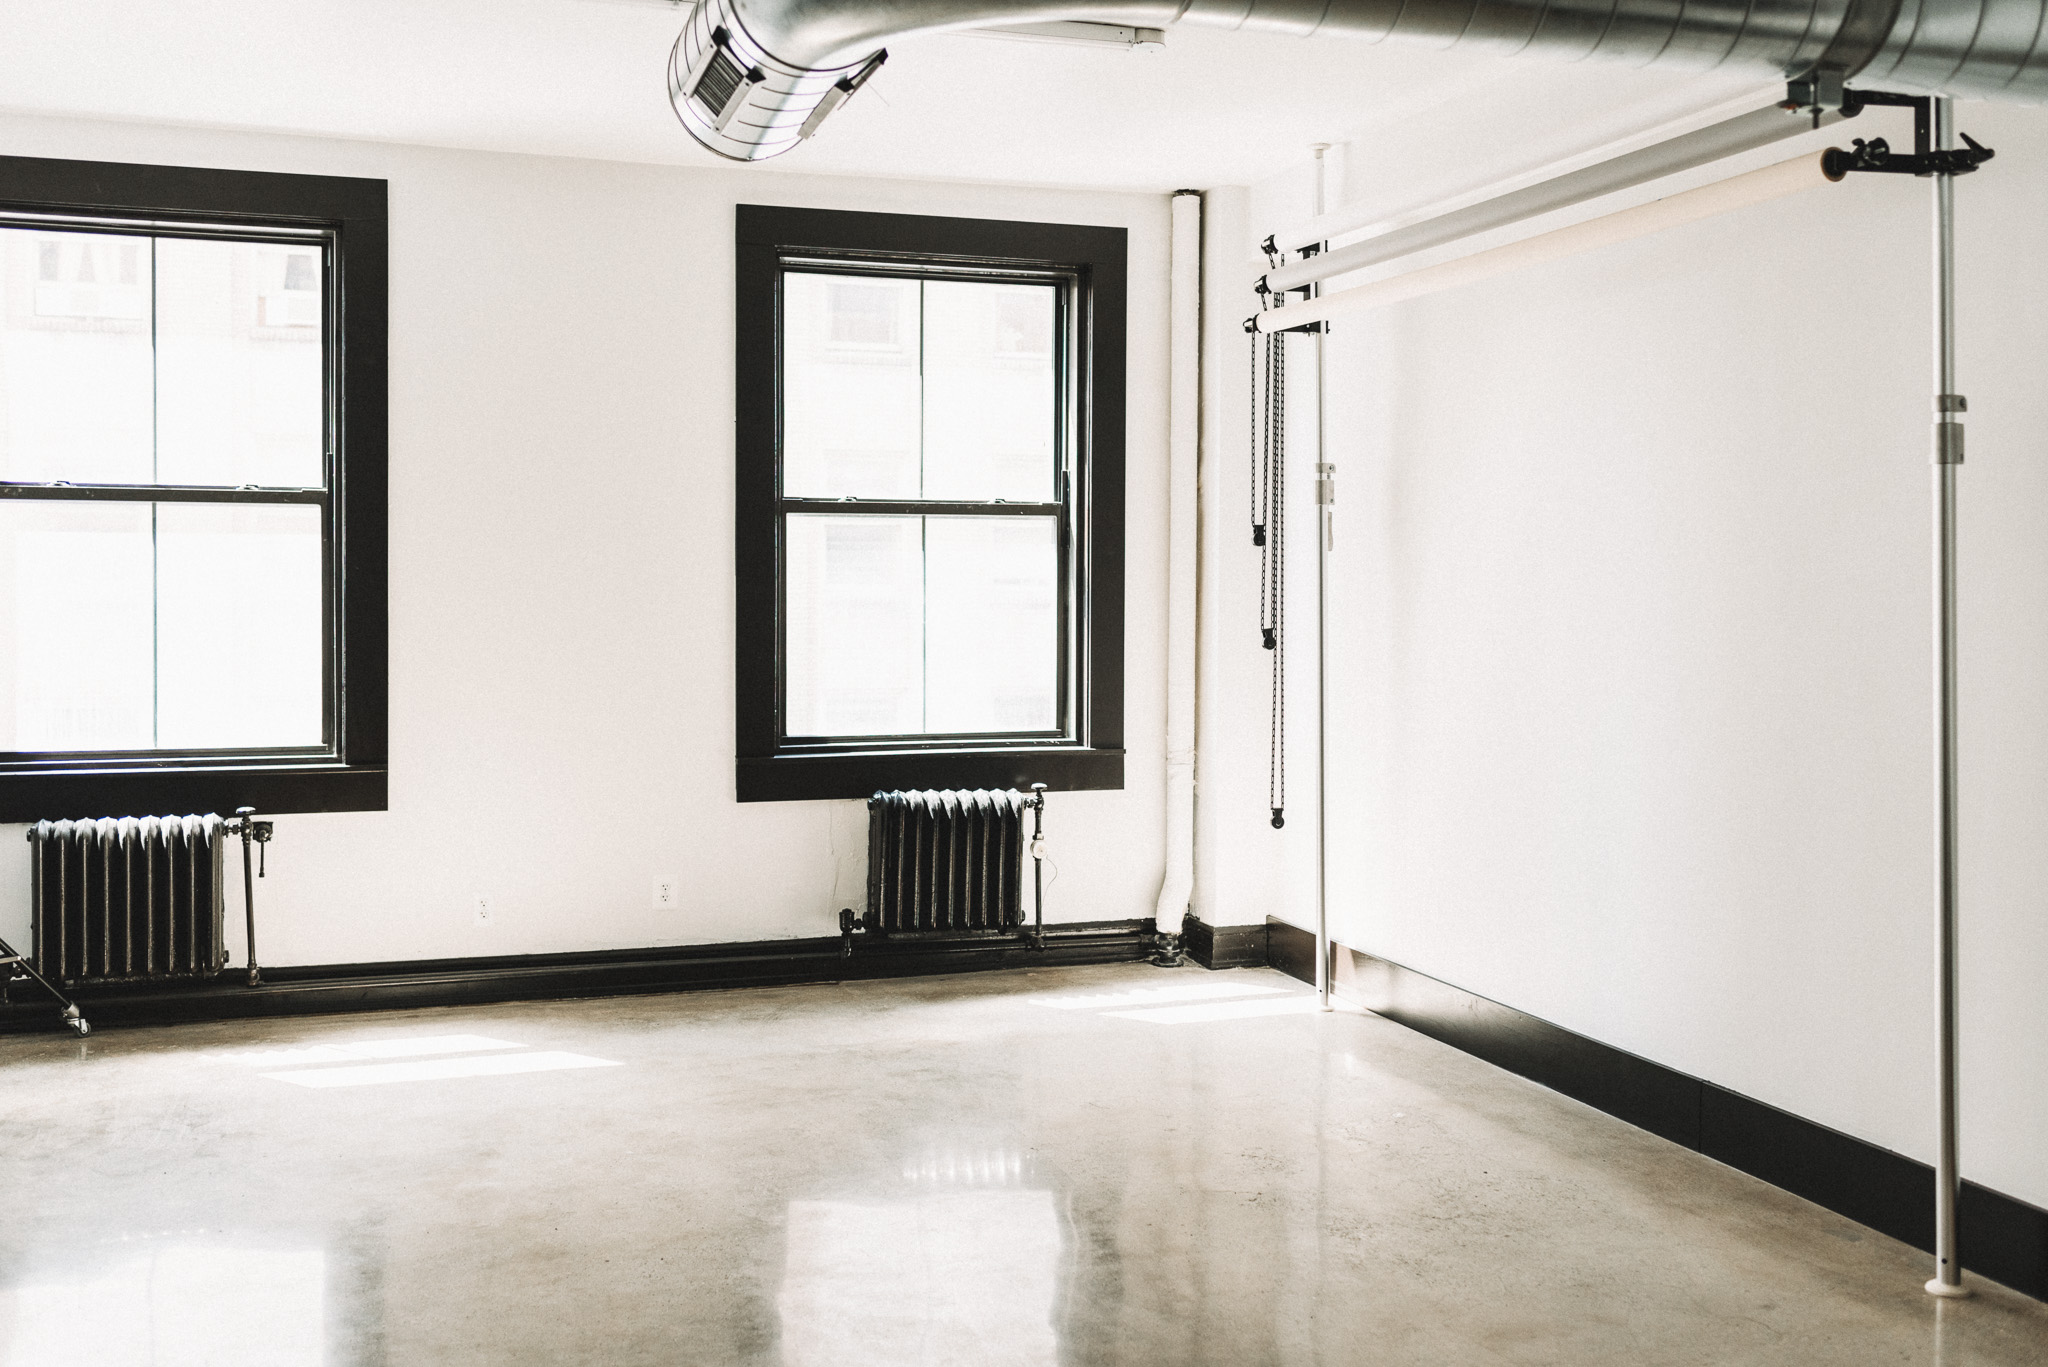 Laur Nash Photography - Studio Located in Downtown Pontiac, Michigan